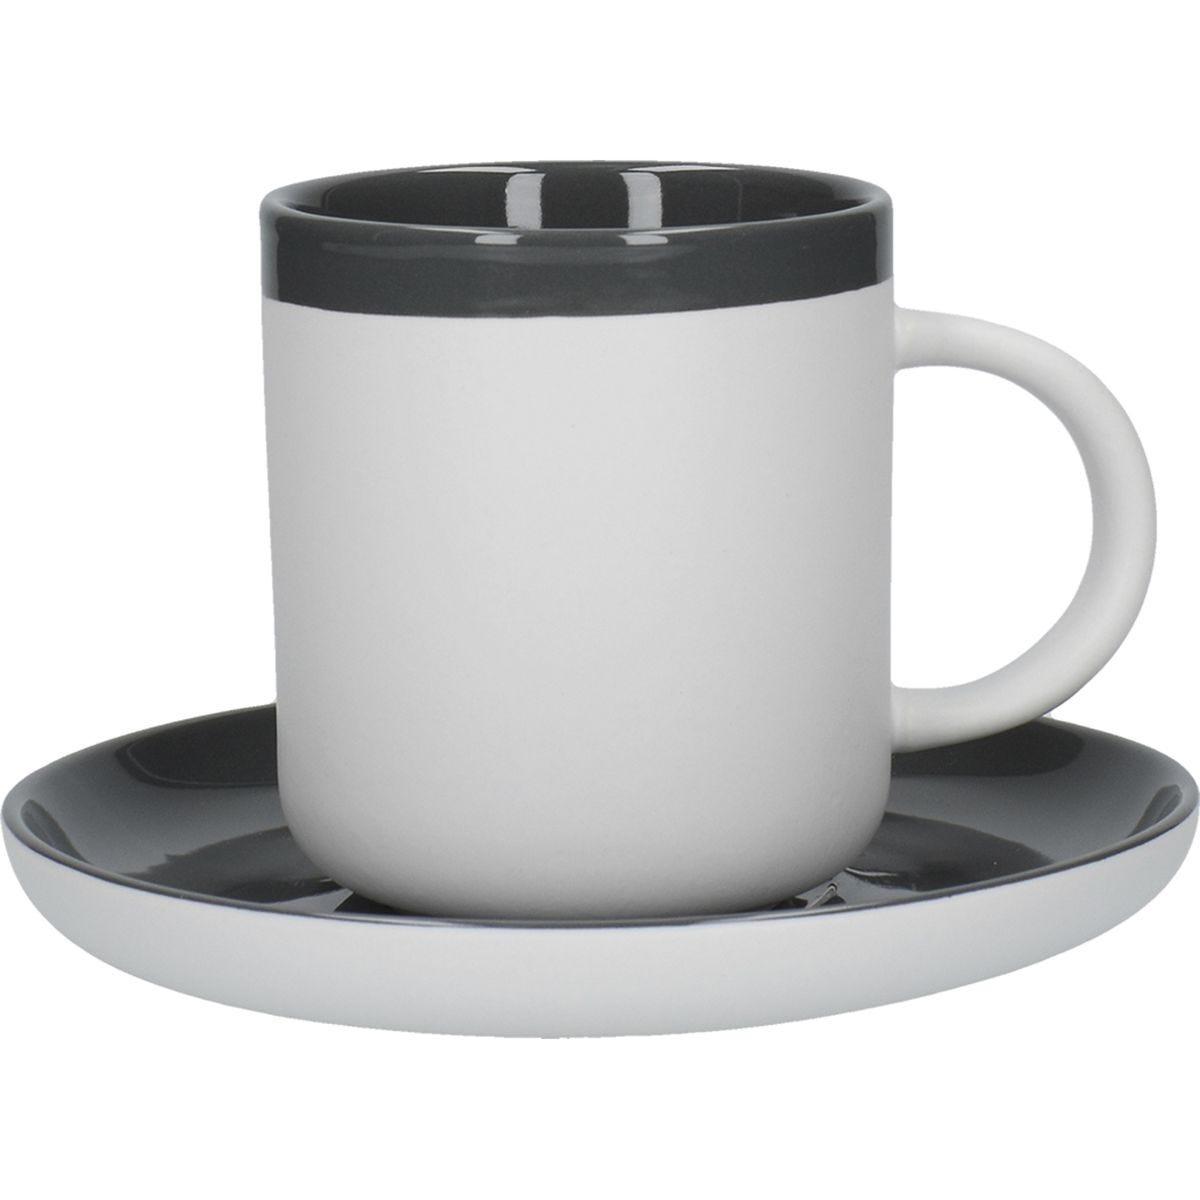 La Cafetiere Ceramic Barcelona Espresso Cup and Saucer - Cool Grey 120ml